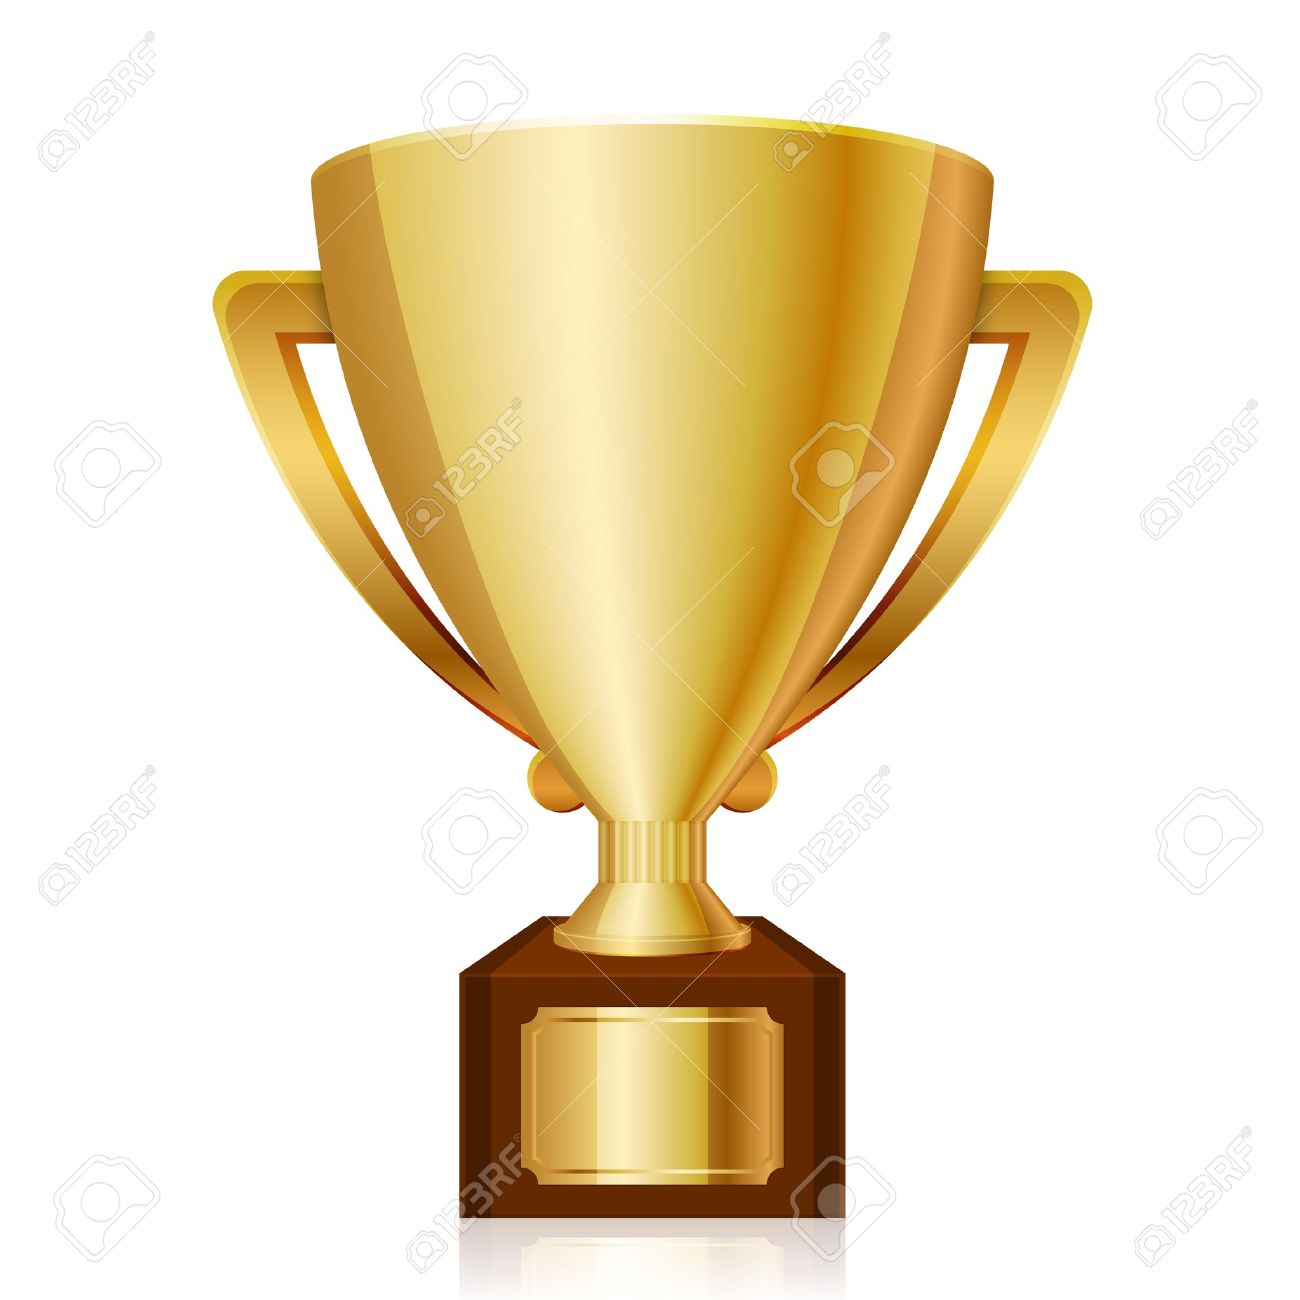 illustration of gold shiny trophy - 20940754